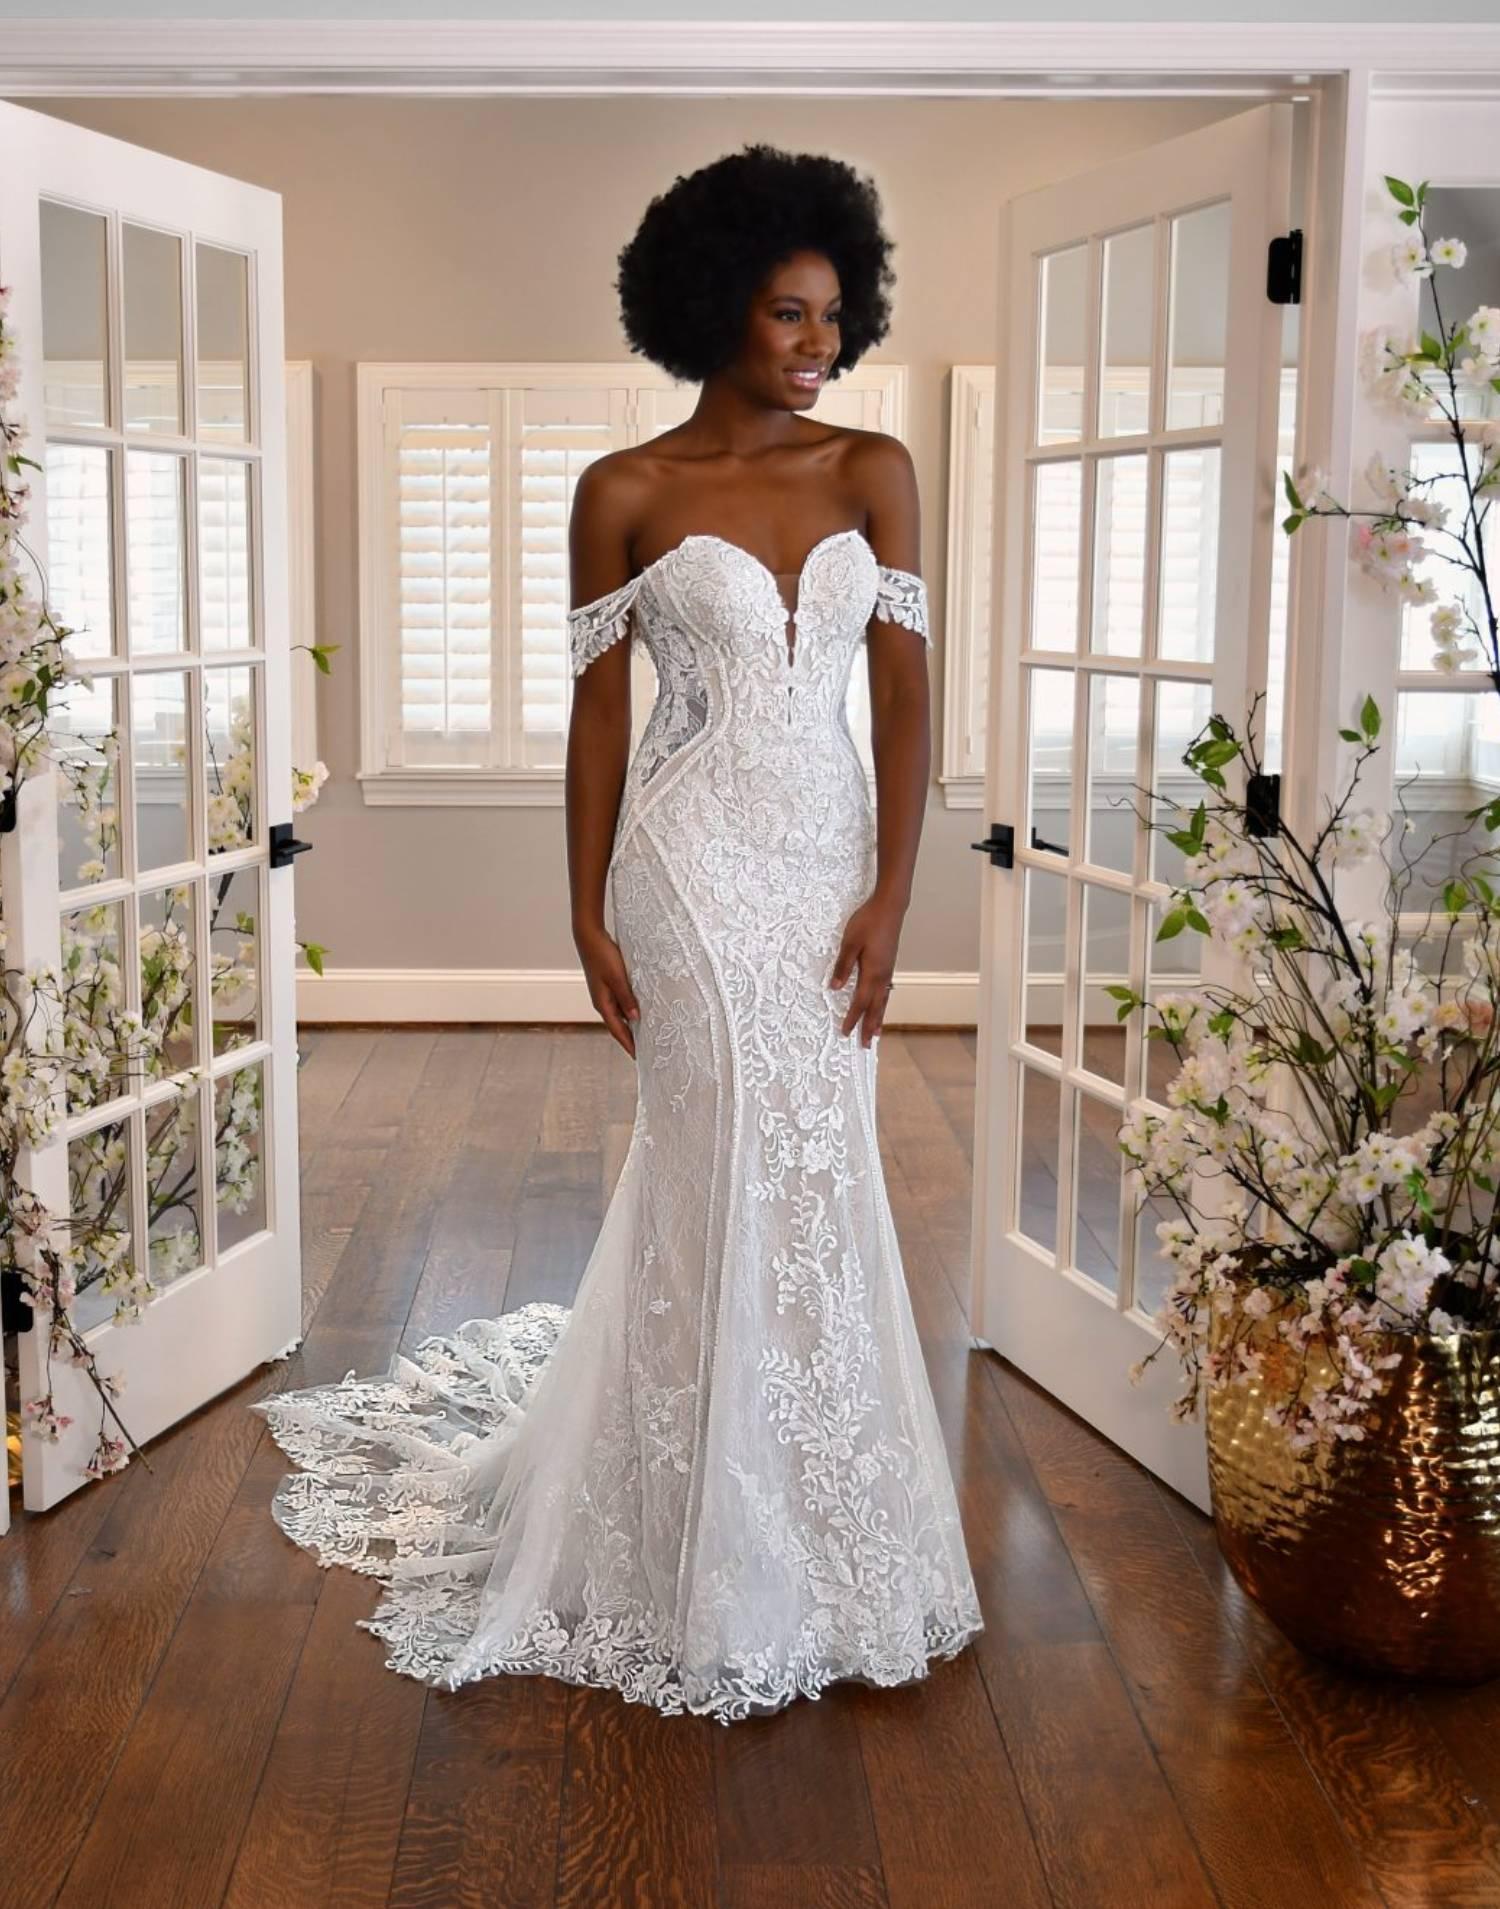 D3088-wedding-dress-Essense-of-Australia-additional-view-product-min